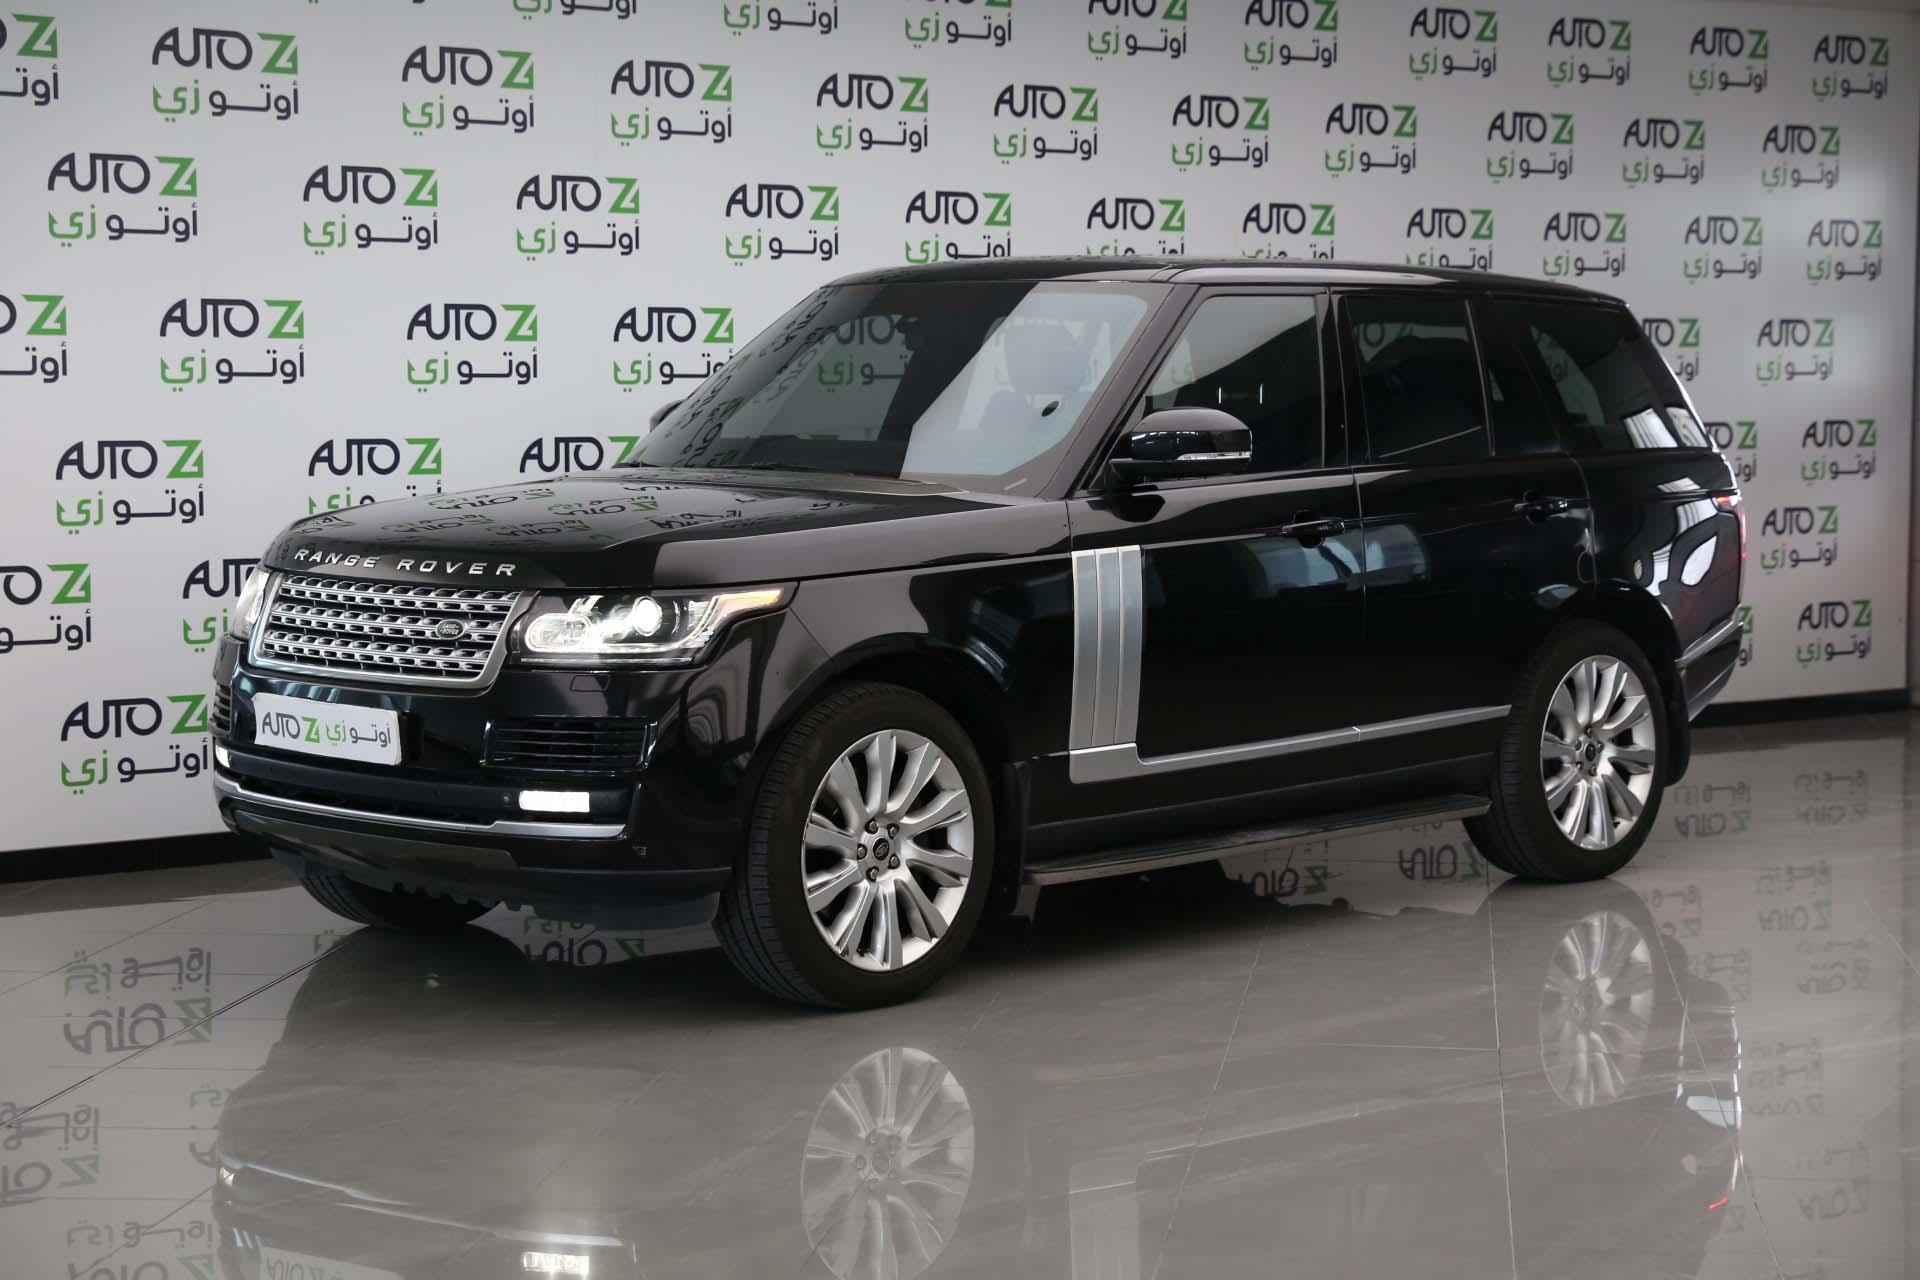 Range Rover Vogue Super Charged-2013—Black